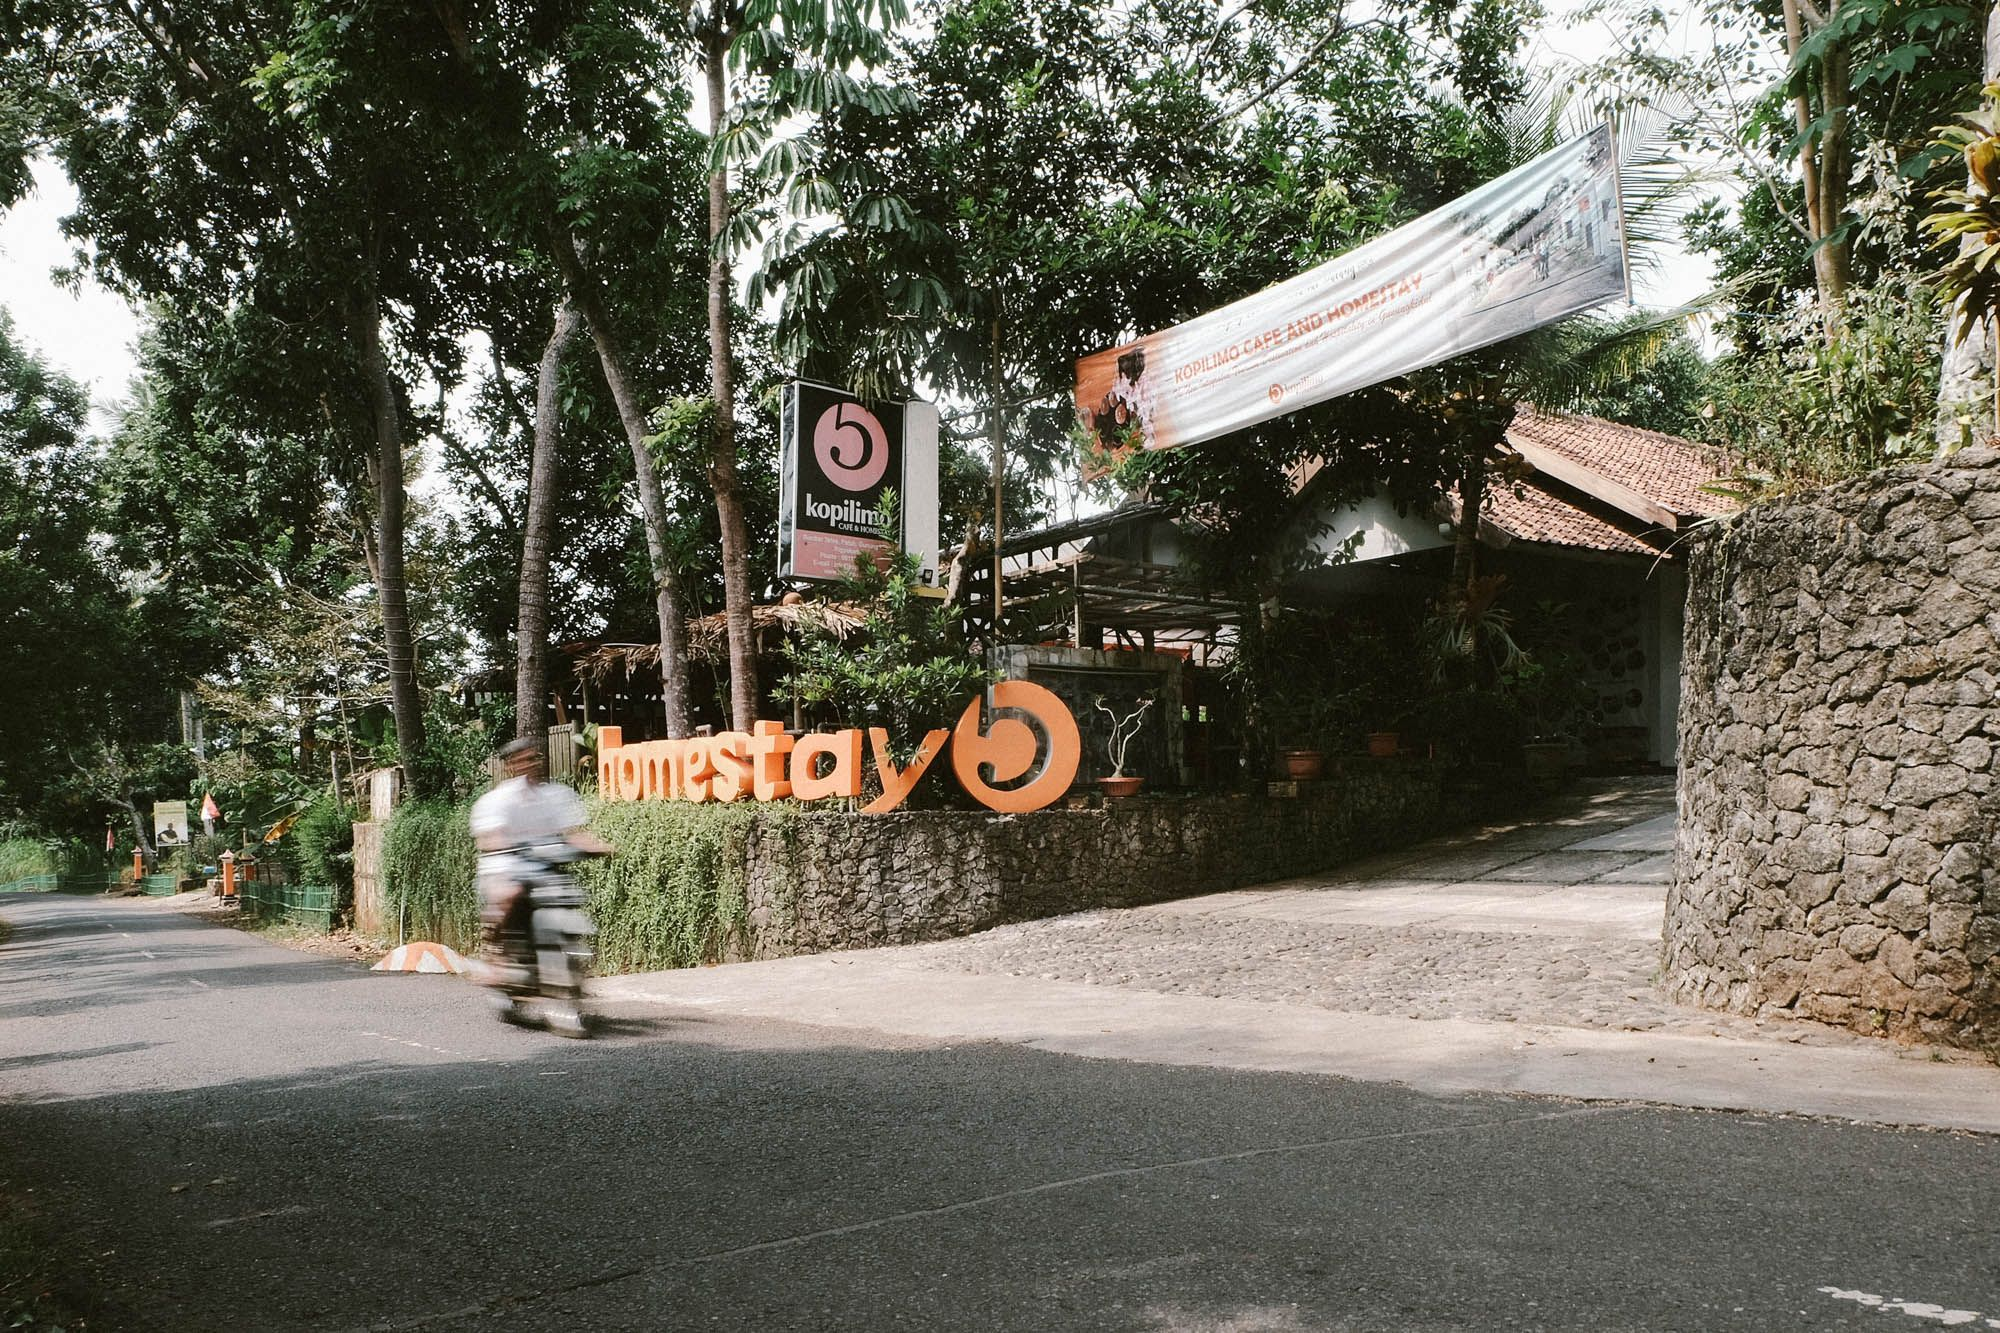 Kopilimo Cafe & Homestay, Gunung Kidul